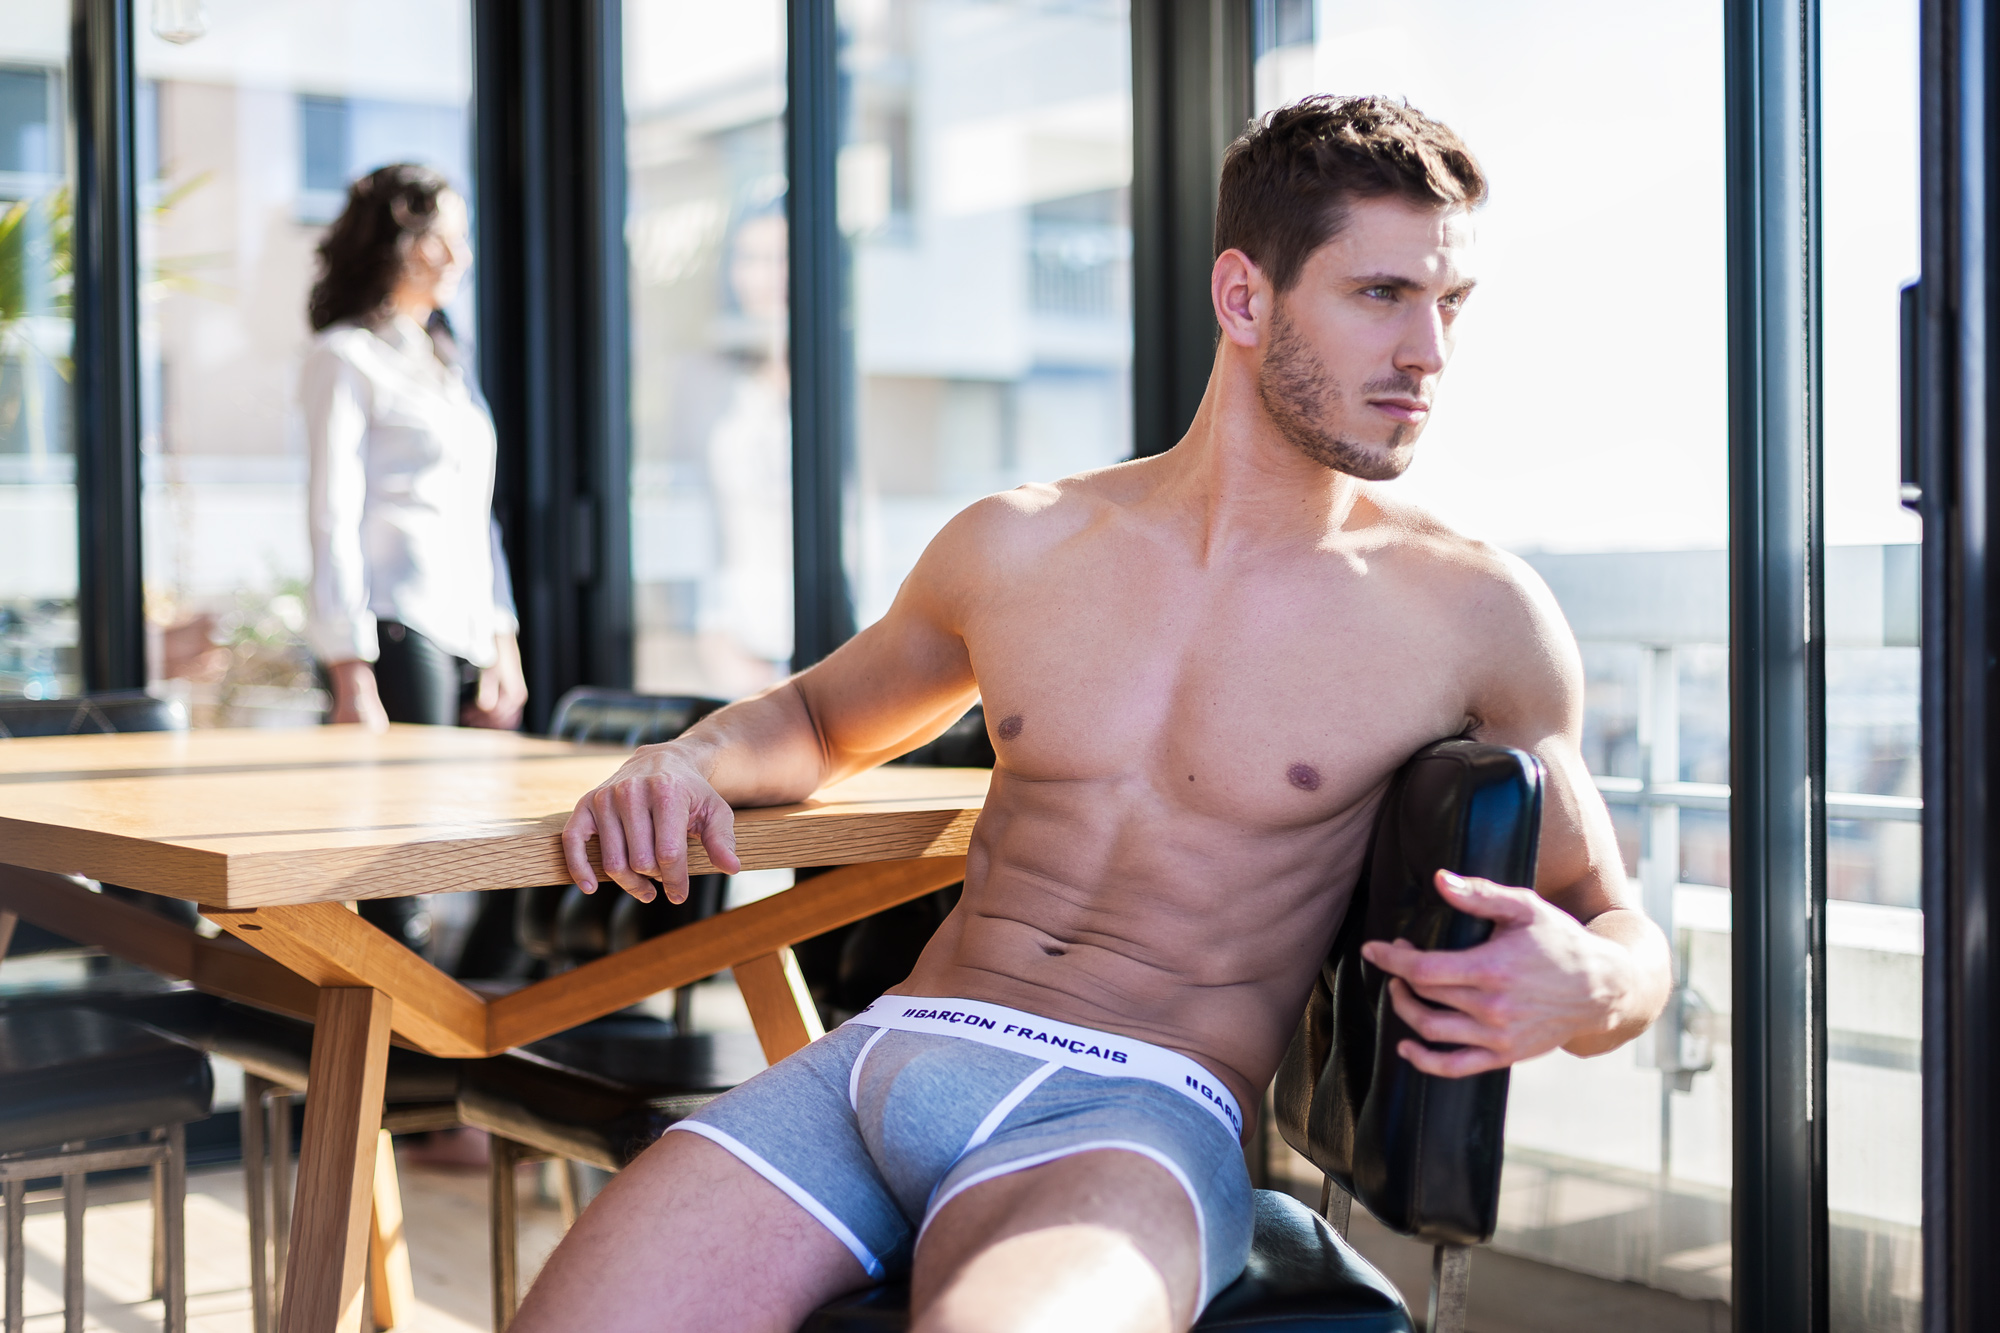 plan cul gay montreal jeune sportif gay